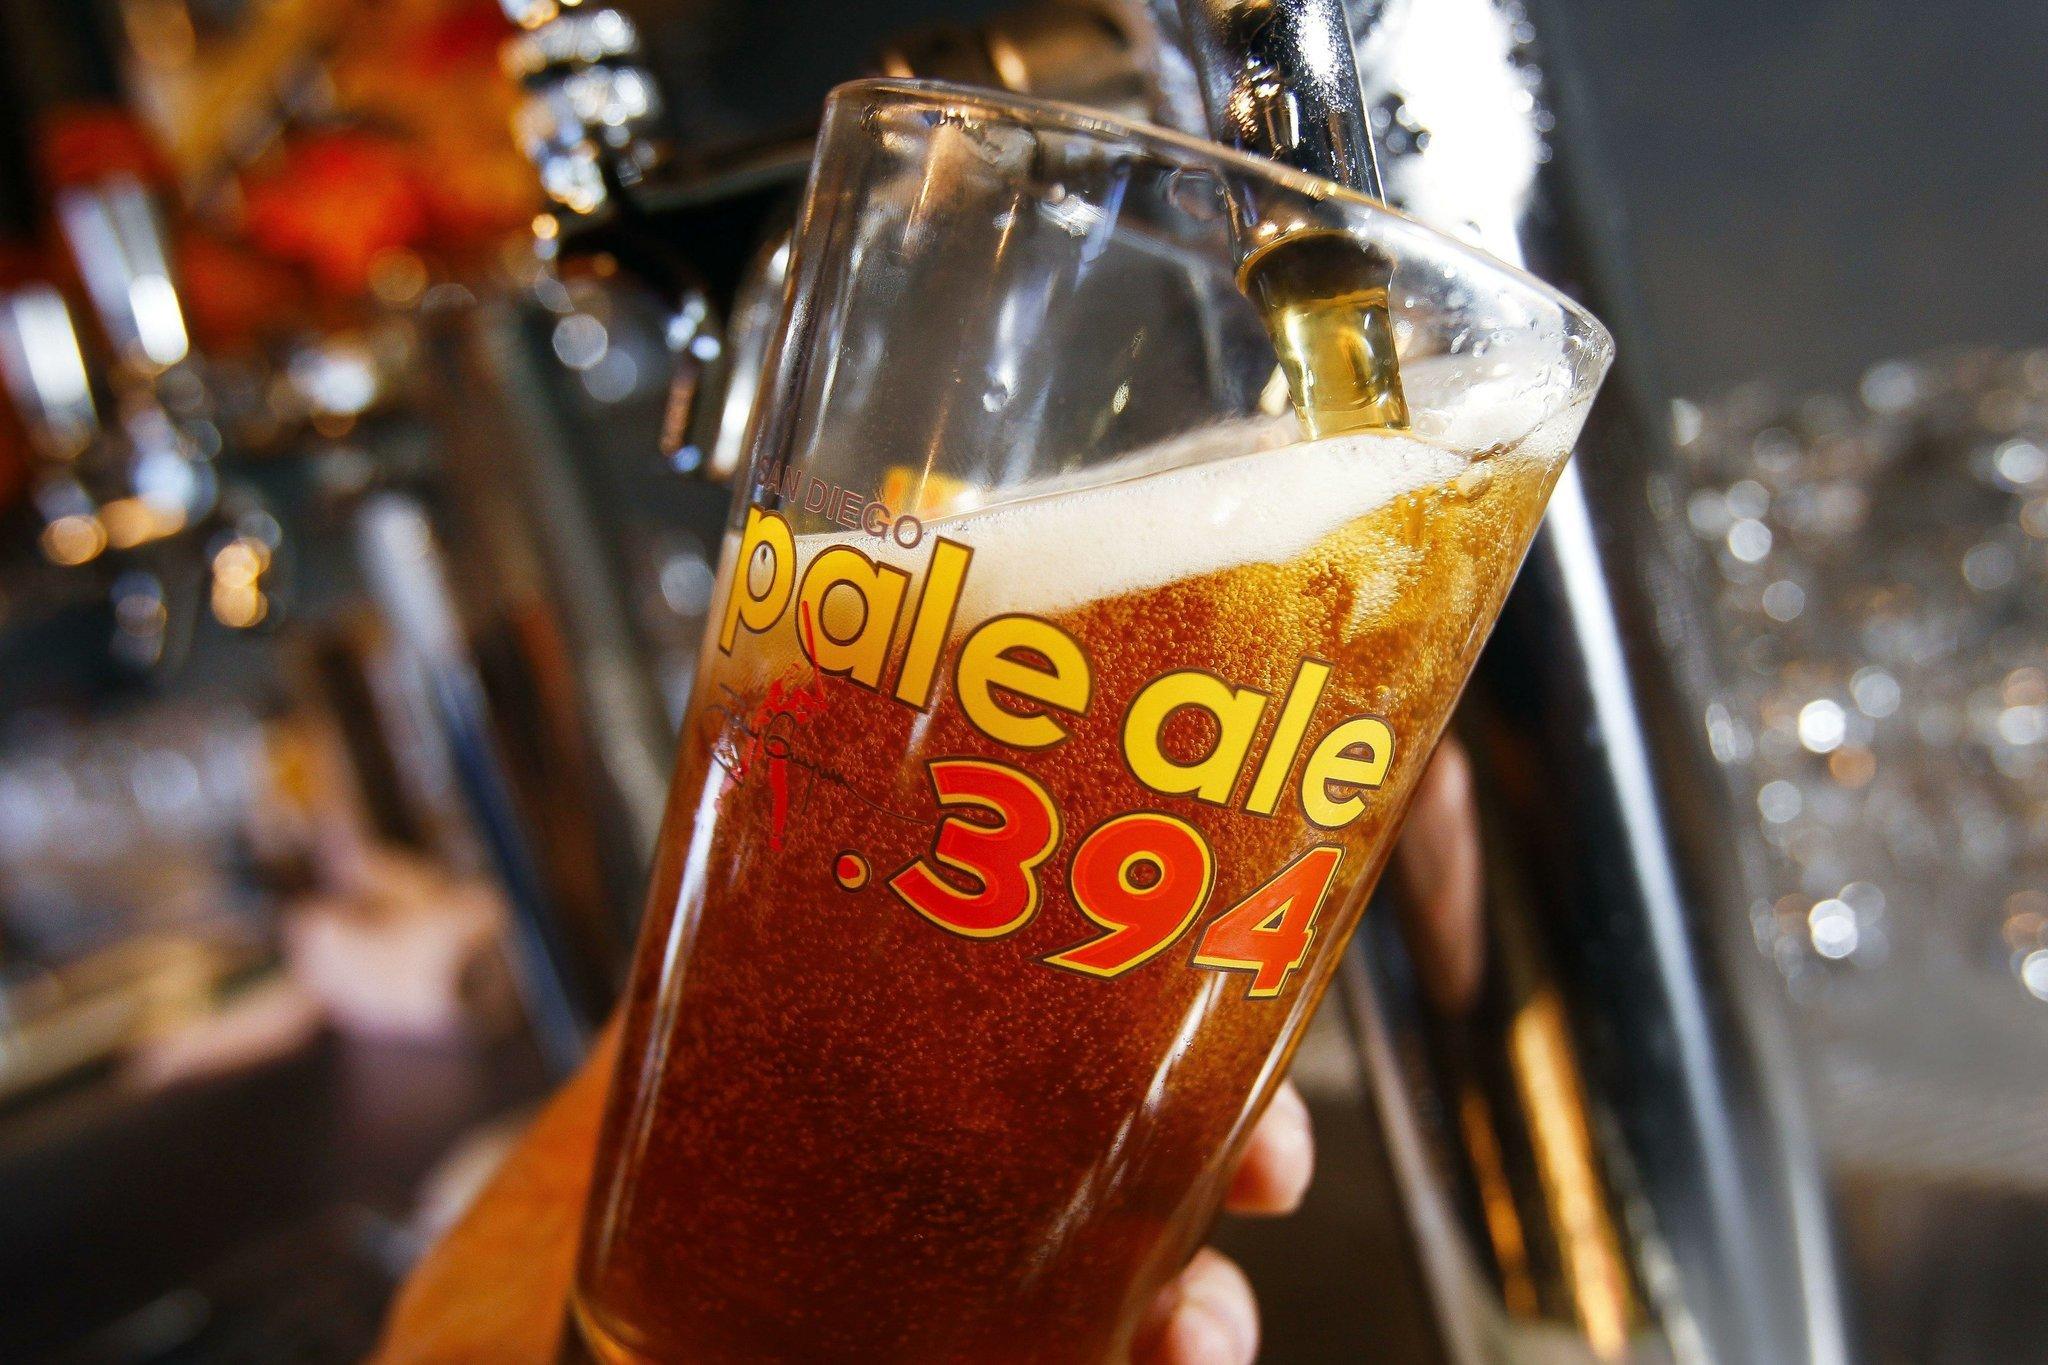 Ordering smart regulation for craft beer industry